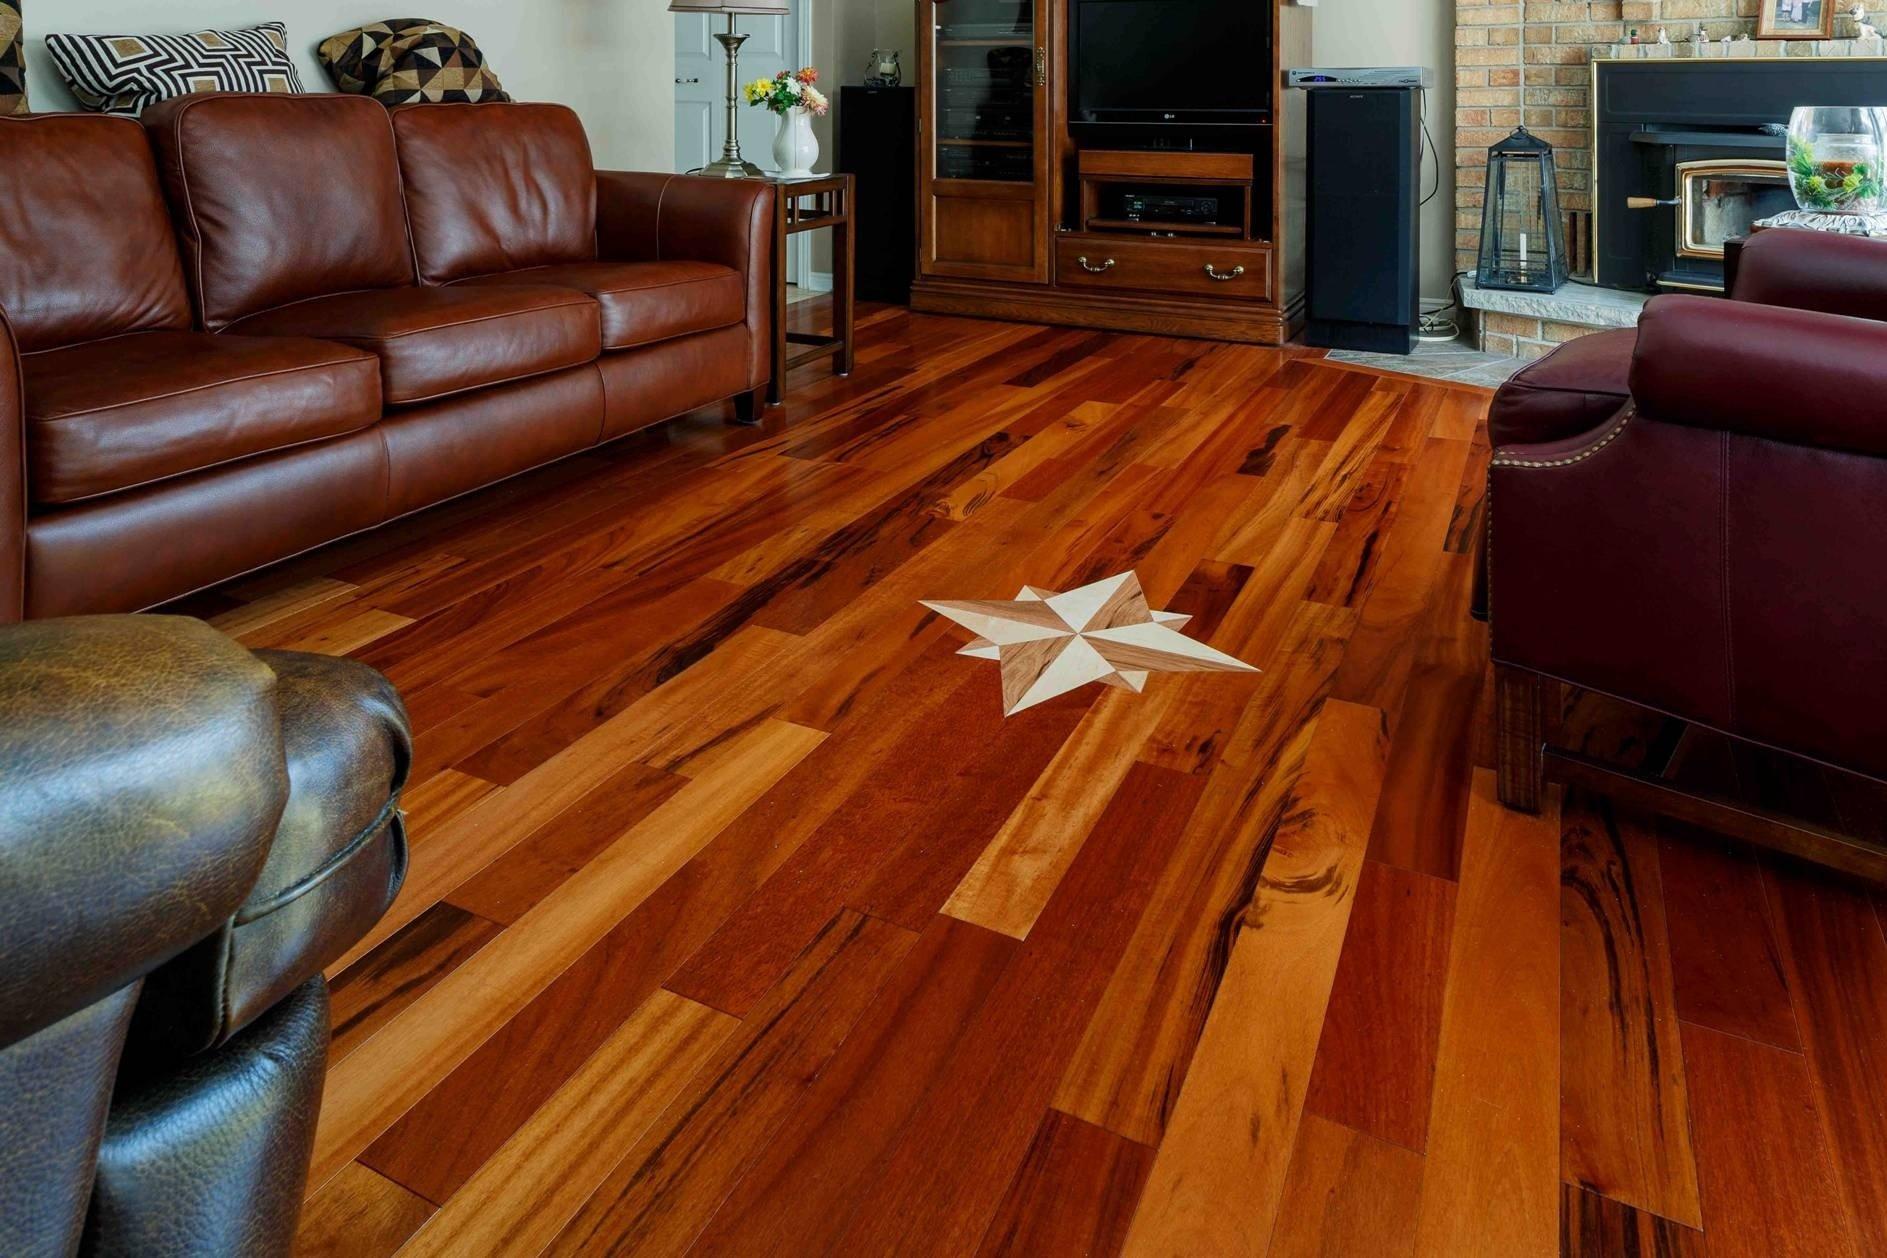 tiger wood hardwood flooring tigerwood flooring pictures GNBWINI